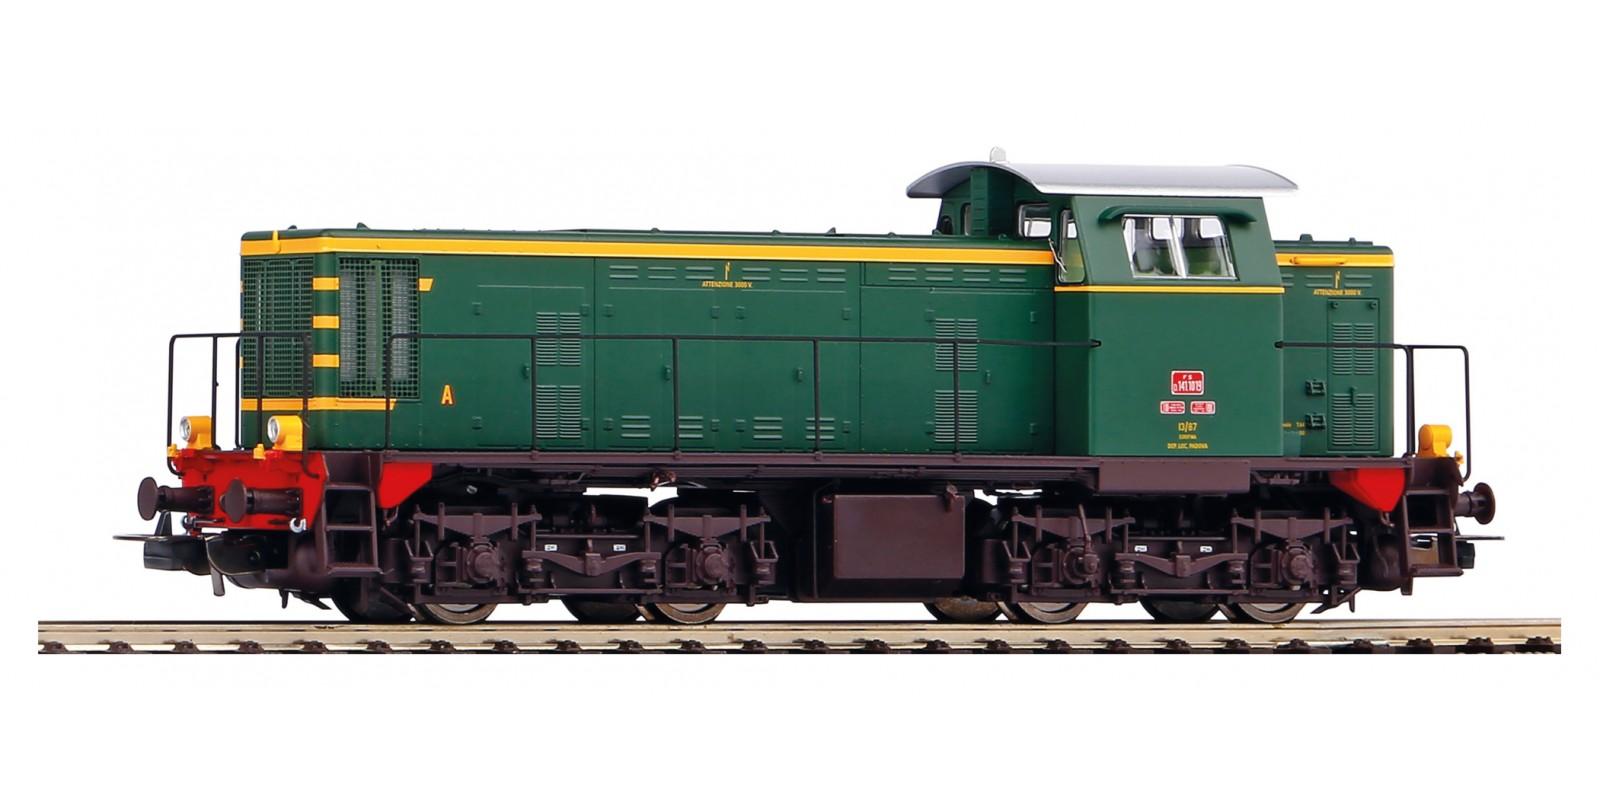 PI52443 Gauge H0 Diesel locomotive D.141 FS of epoch IV with sound, AC